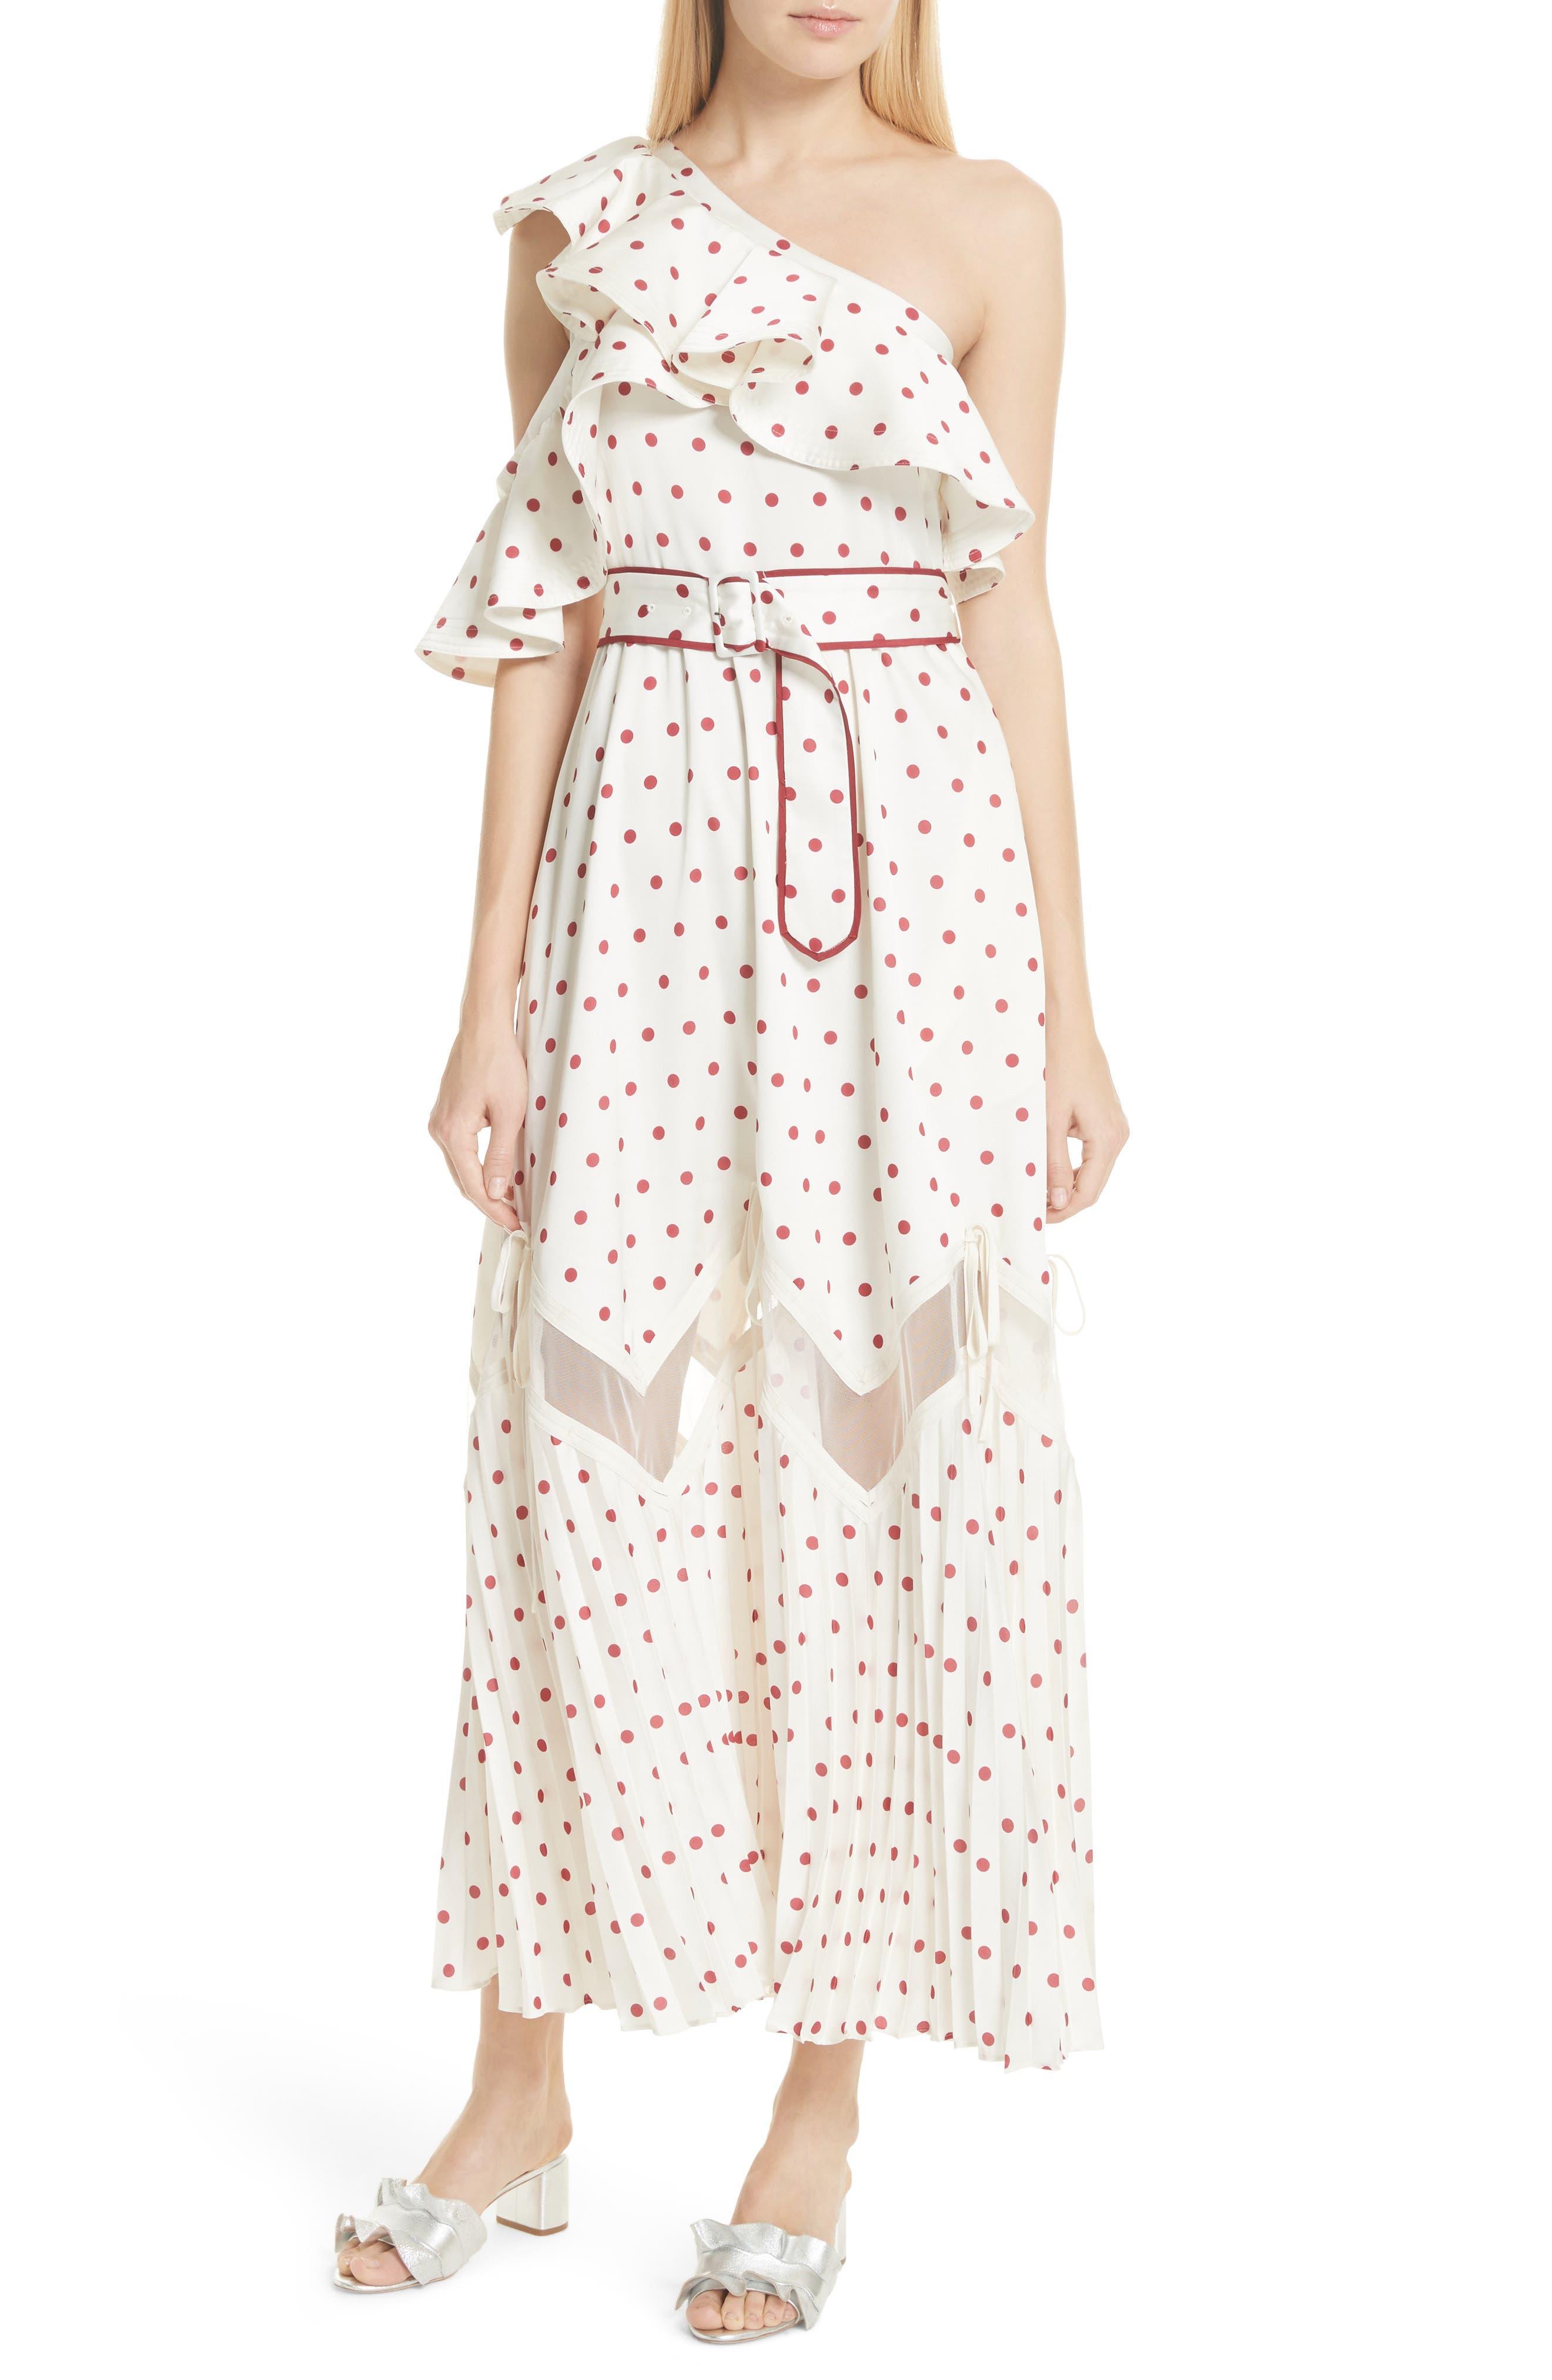 Self-Portrait Polka Dot Ruffle Satin Dress